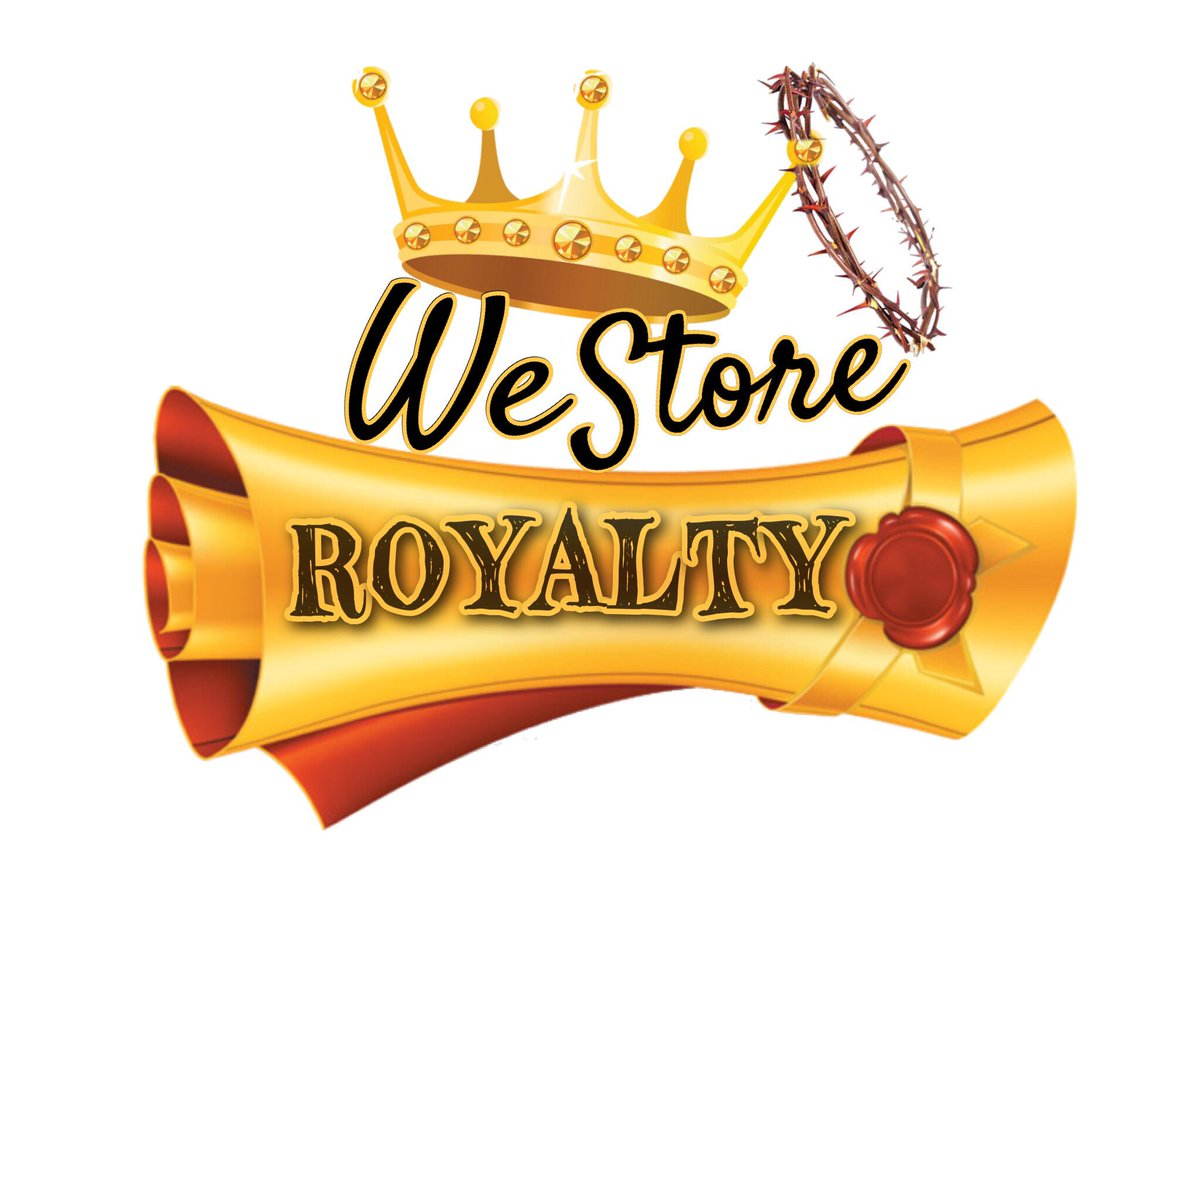 A N O T H E R  DM FOR CUSTOM LOGO PRICES  #Logos #BrandYourself #ASU22 #Entrepreneurs<br>http://pic.twitter.com/FWpkcYYBgf